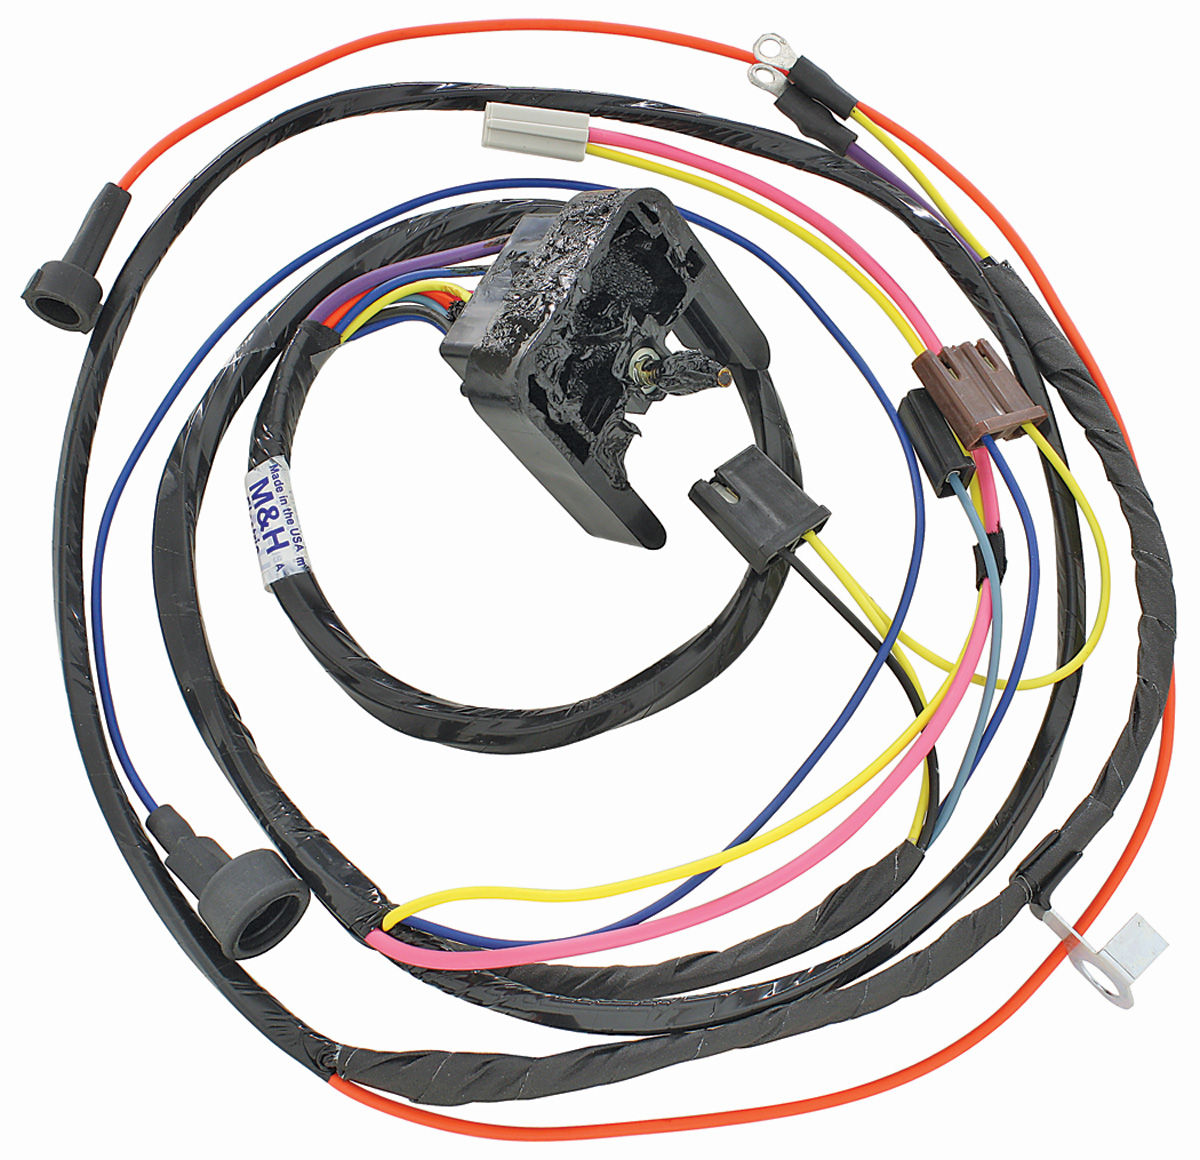 hight resolution of original 68 camaro wiring harness complete wiring diagram inside1968 camaro engine wiring diagram schematic 21